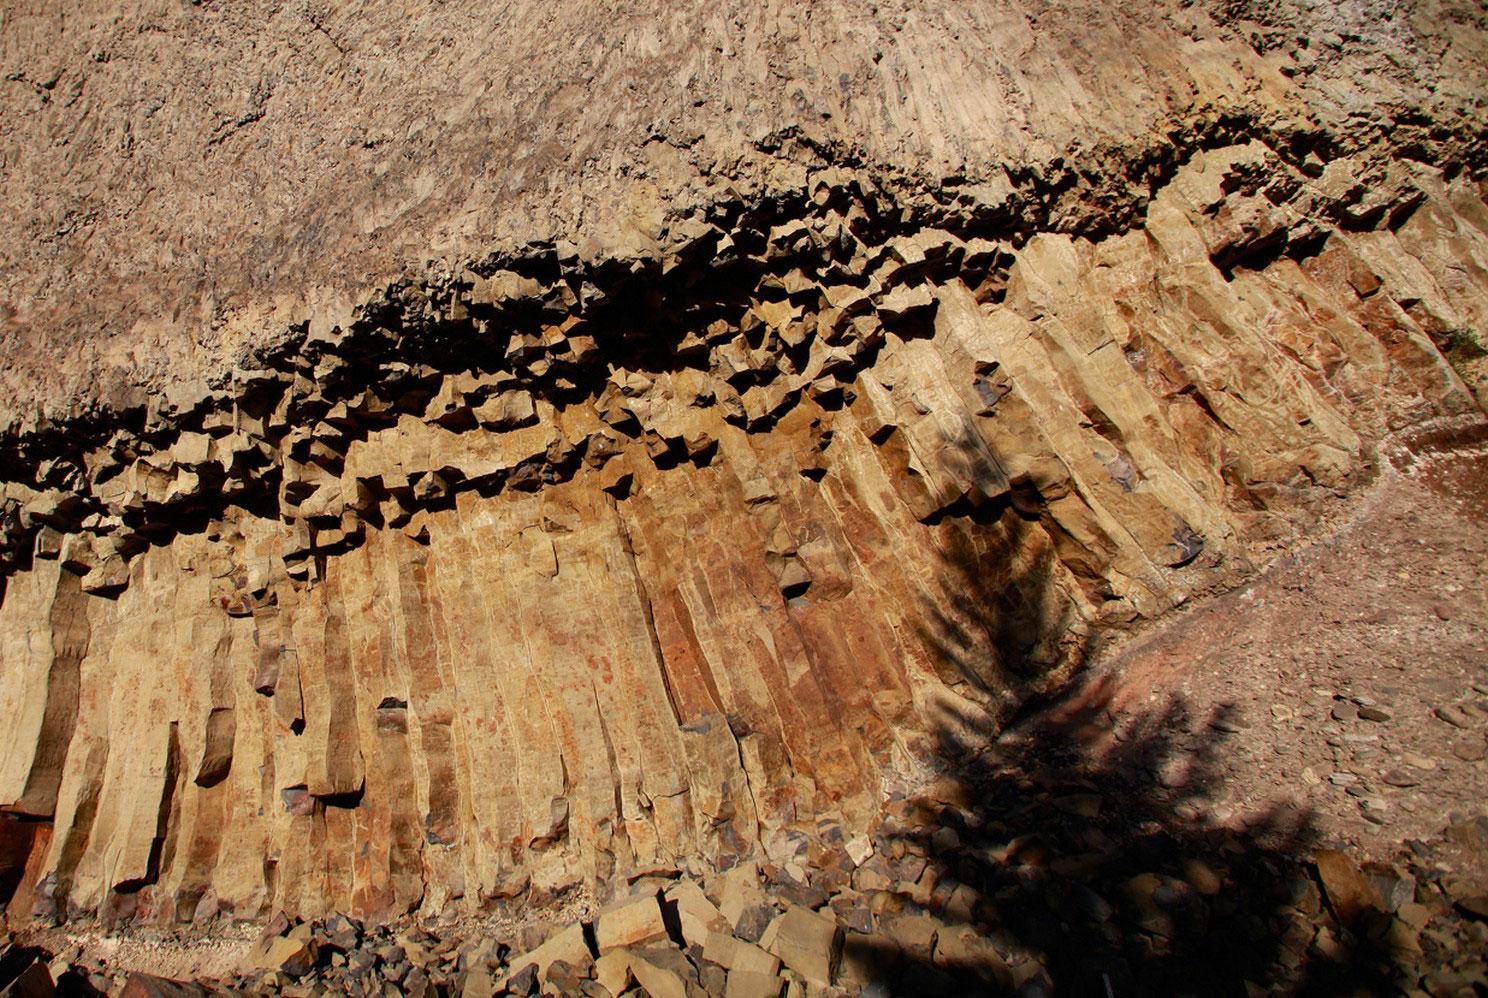 склон скалы